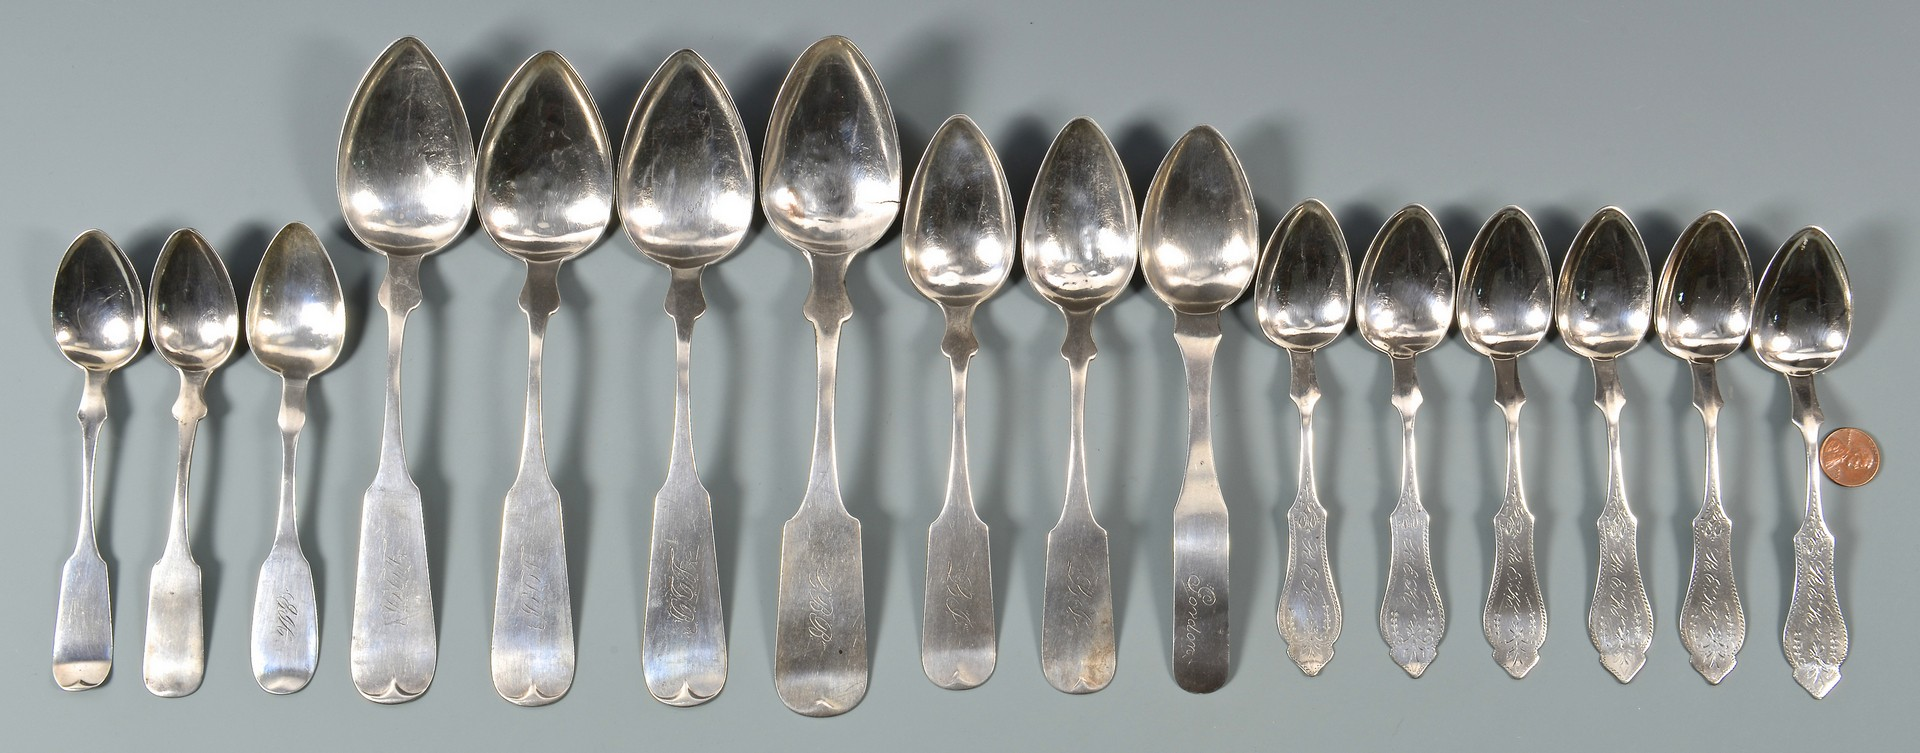 Lot 135: 16 Nashville Coin Silver Spoons